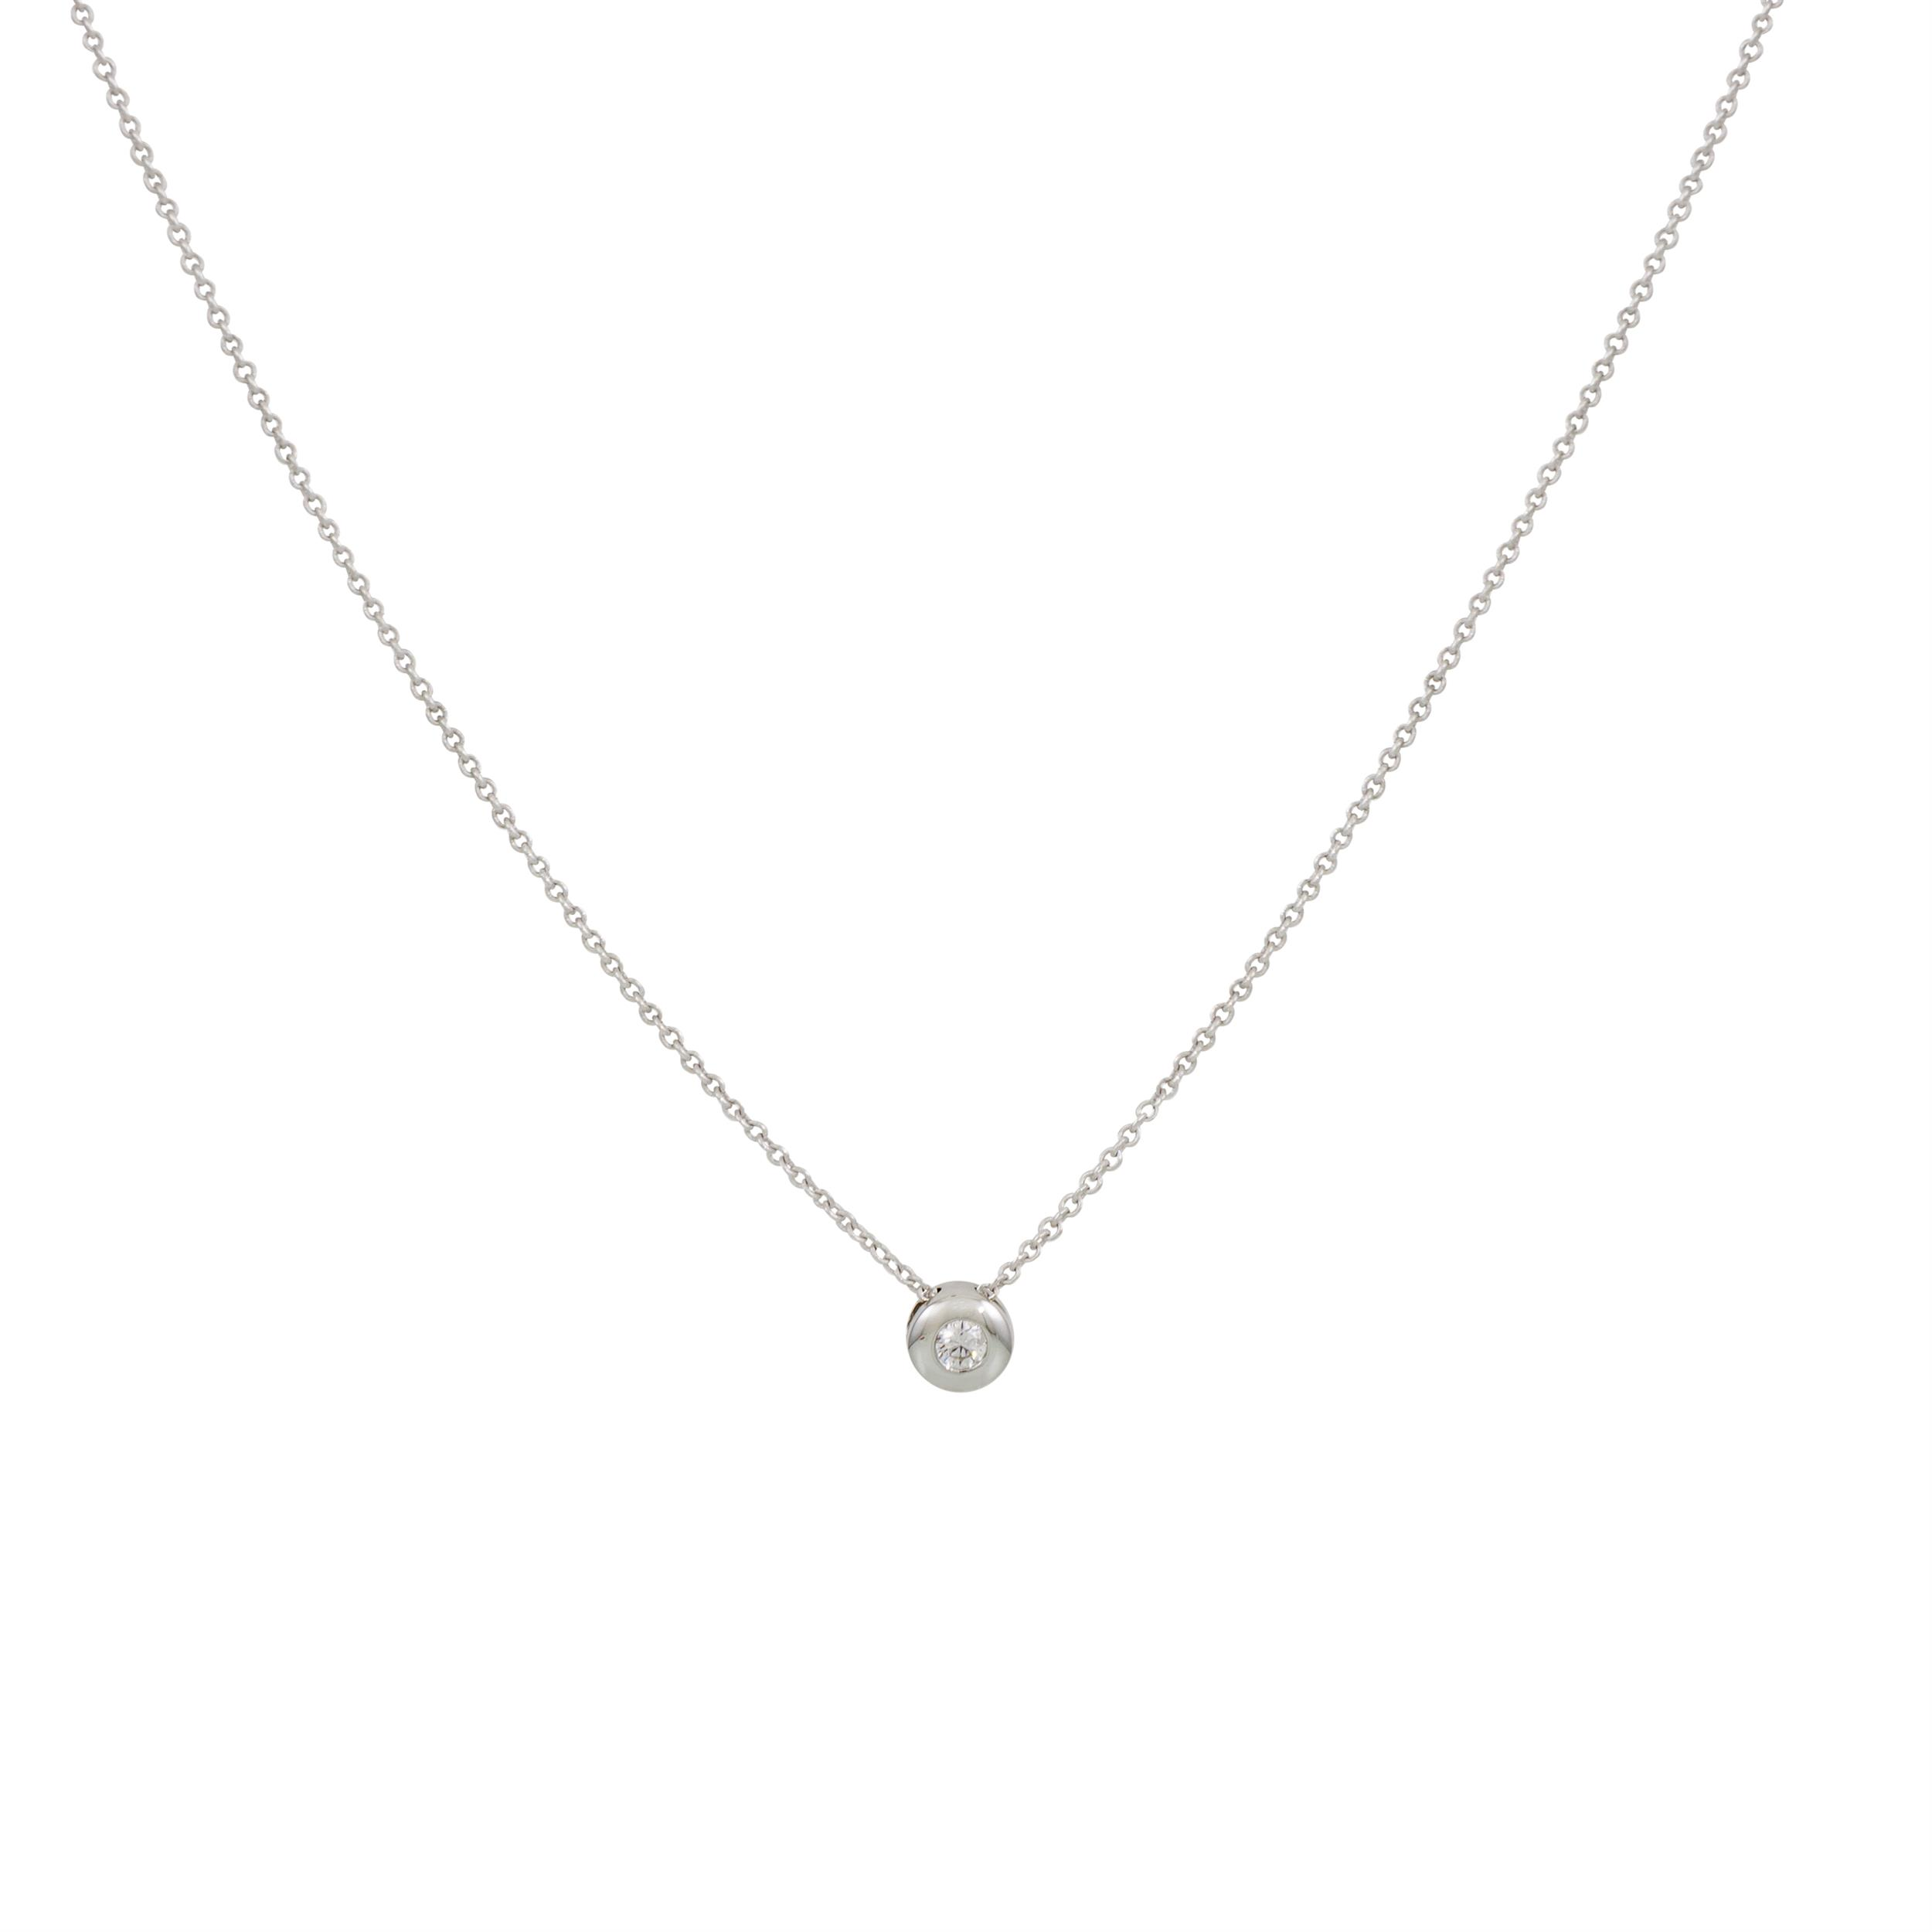 Diamant - 0.054 ct - gh/si3 45 cm - ankerschakel - diamant - 0.054 ct - gh/si3 202.3011.45